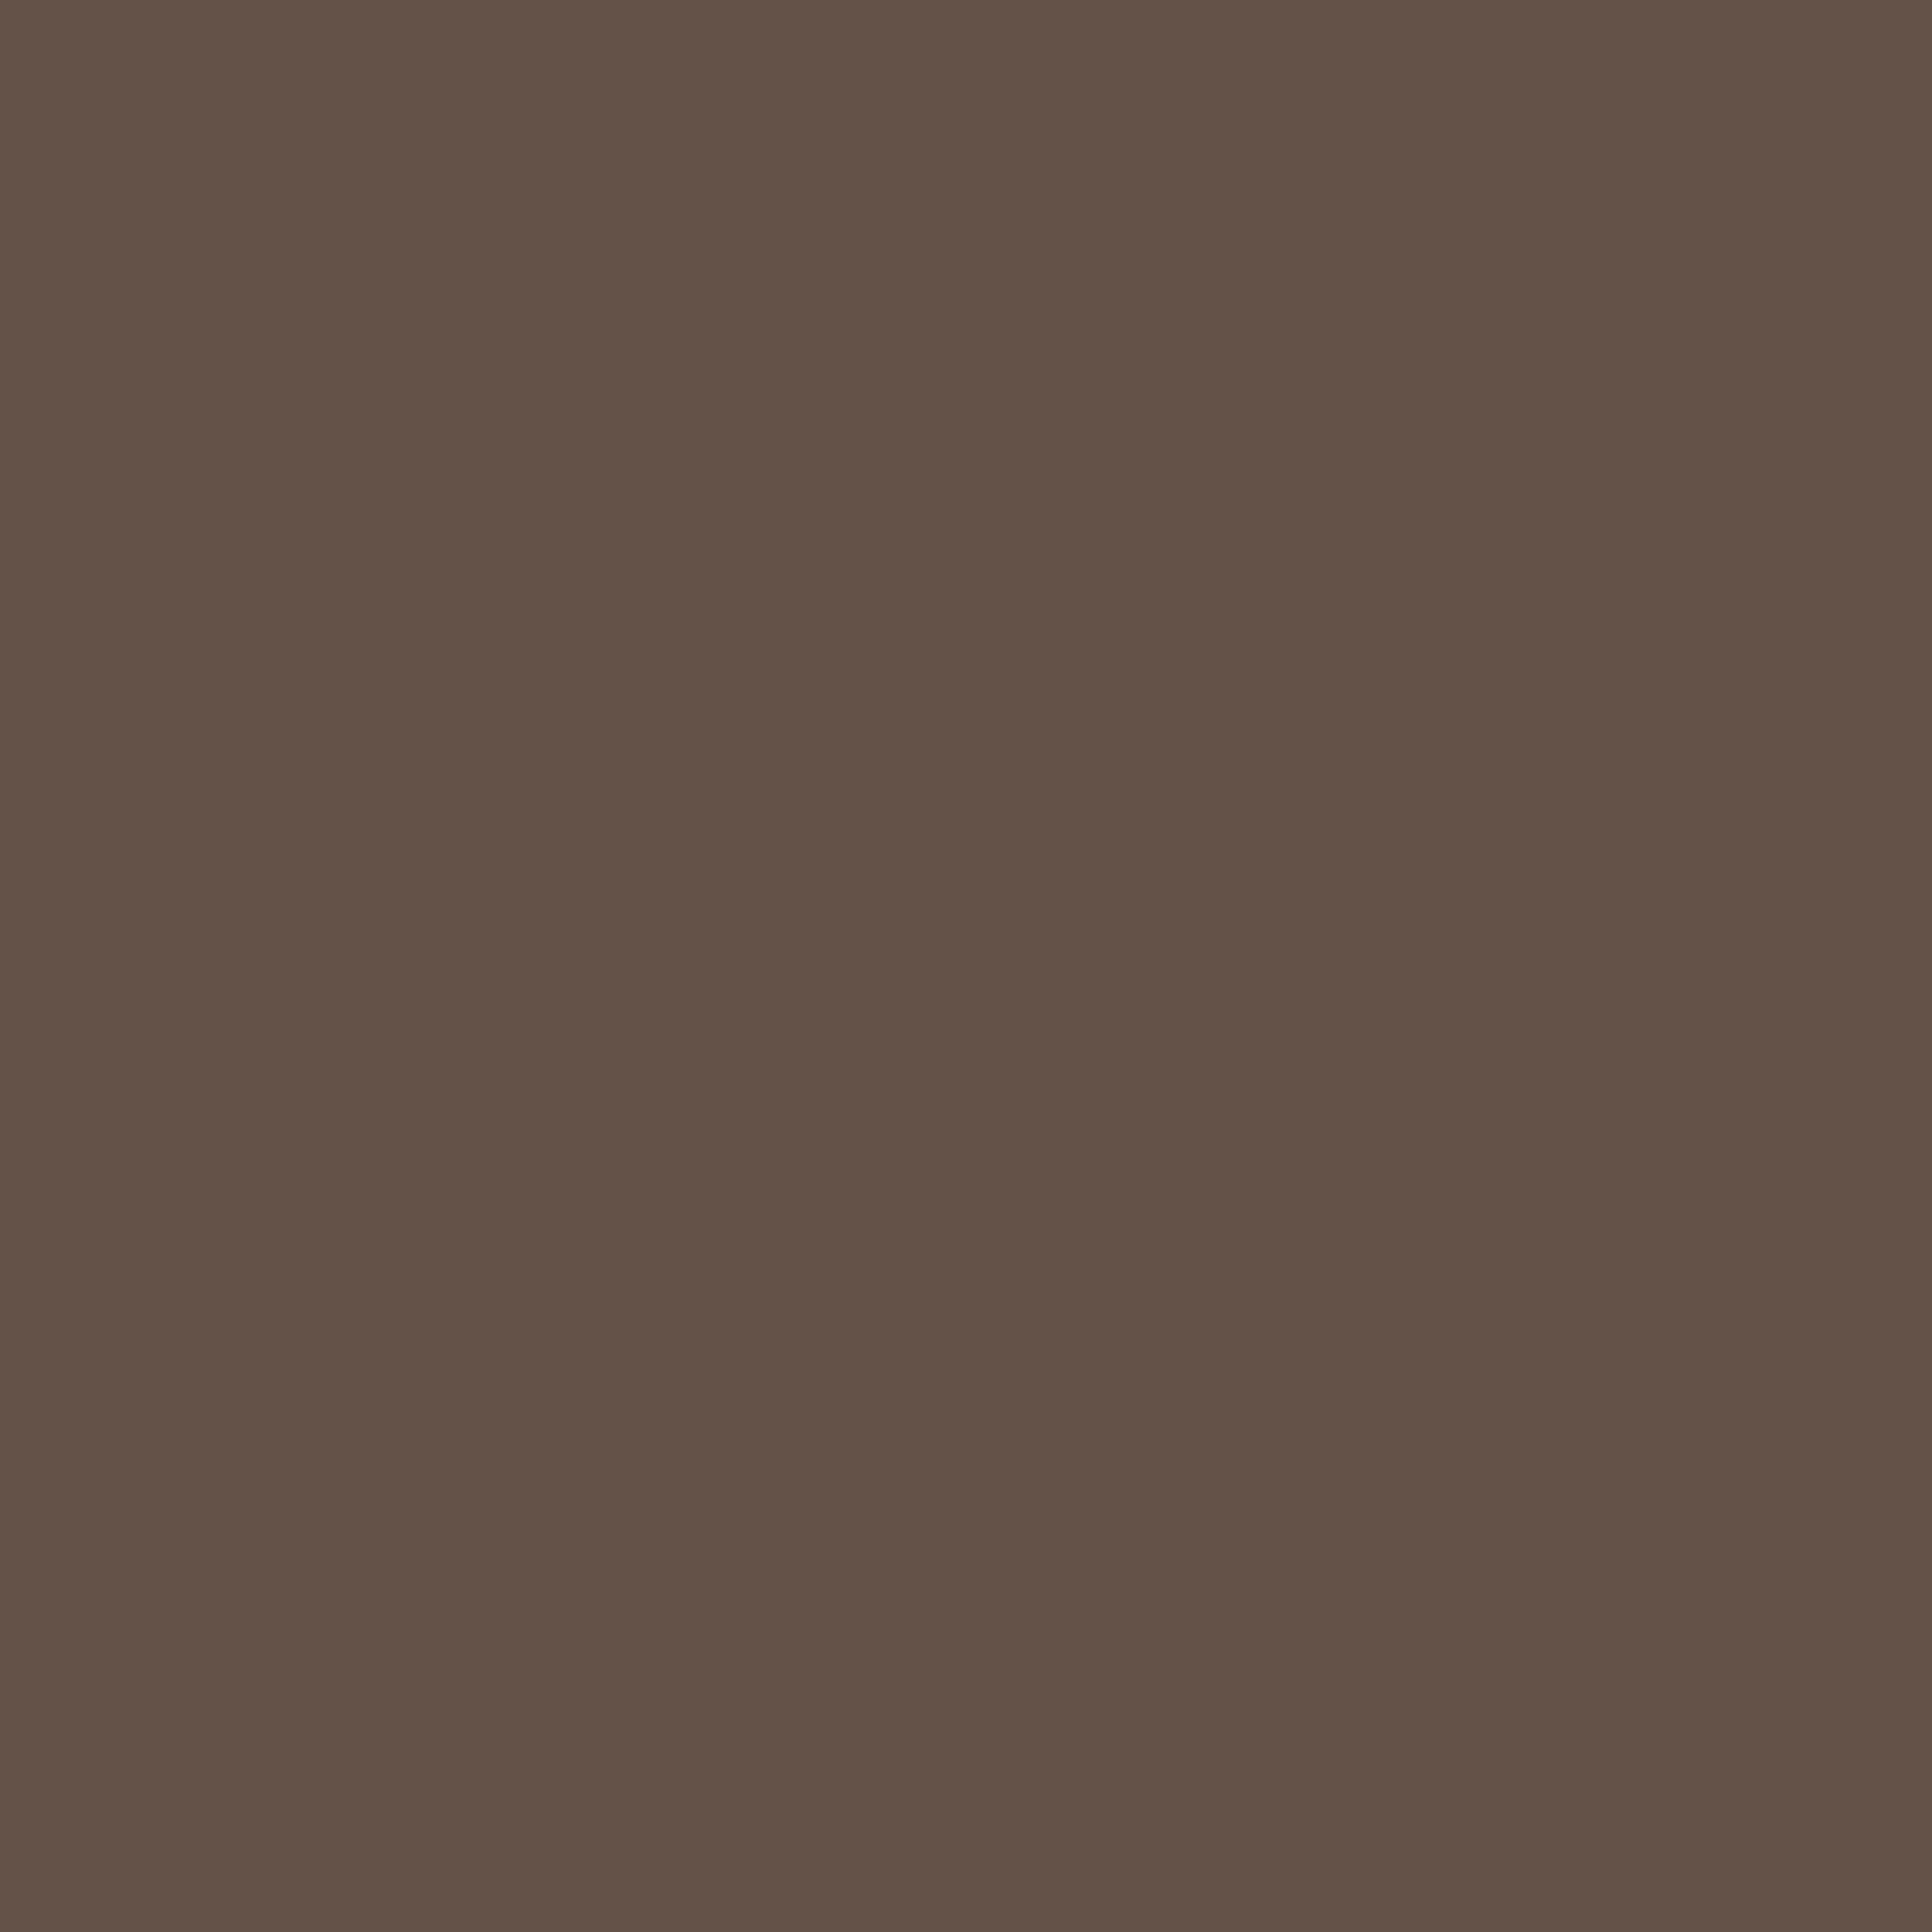 2048x2048 Umber Solid Color Background